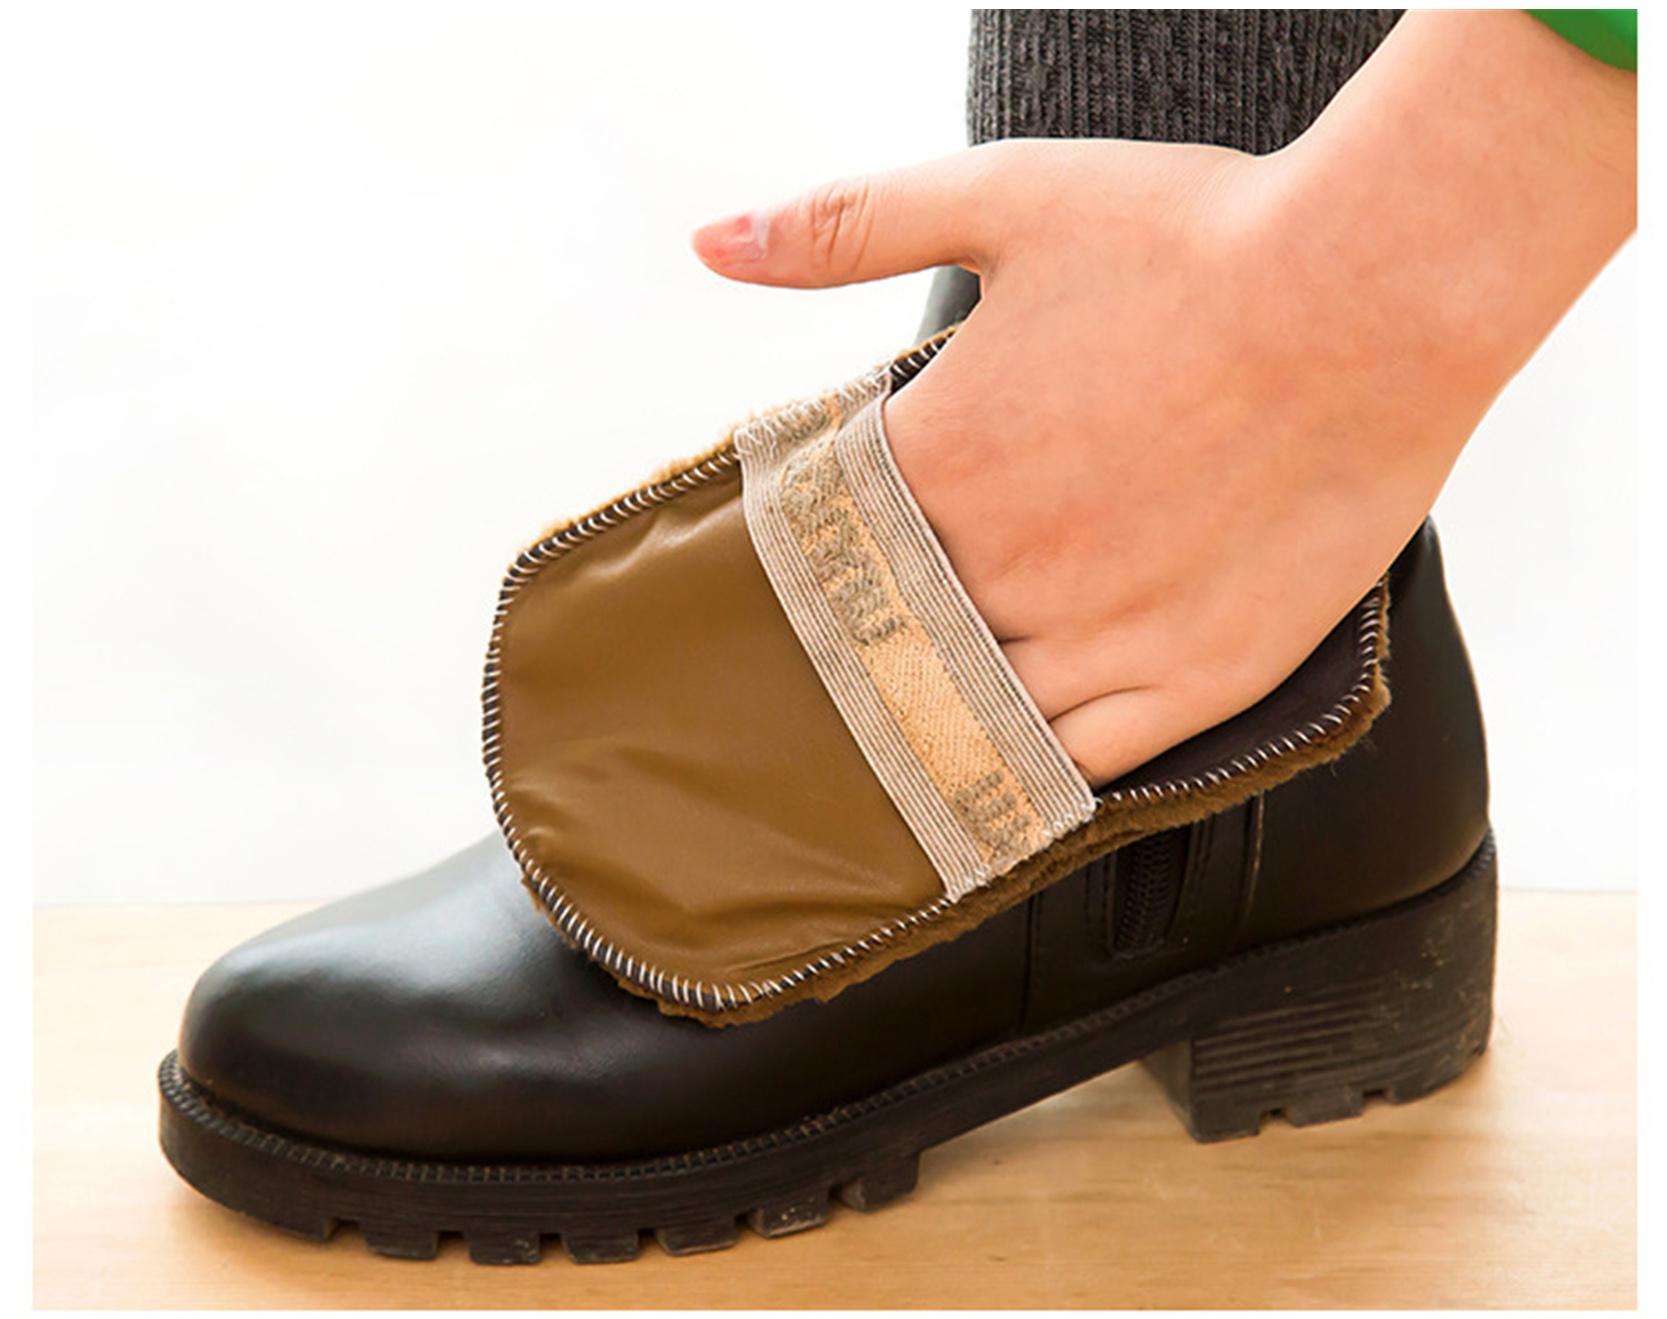 Hot Sale shoe Brush Polish Hair Polisher Polishing Glove Special Cloth for Leather Shoes Bags Equipment Shoe Polisher(China (Mainland))